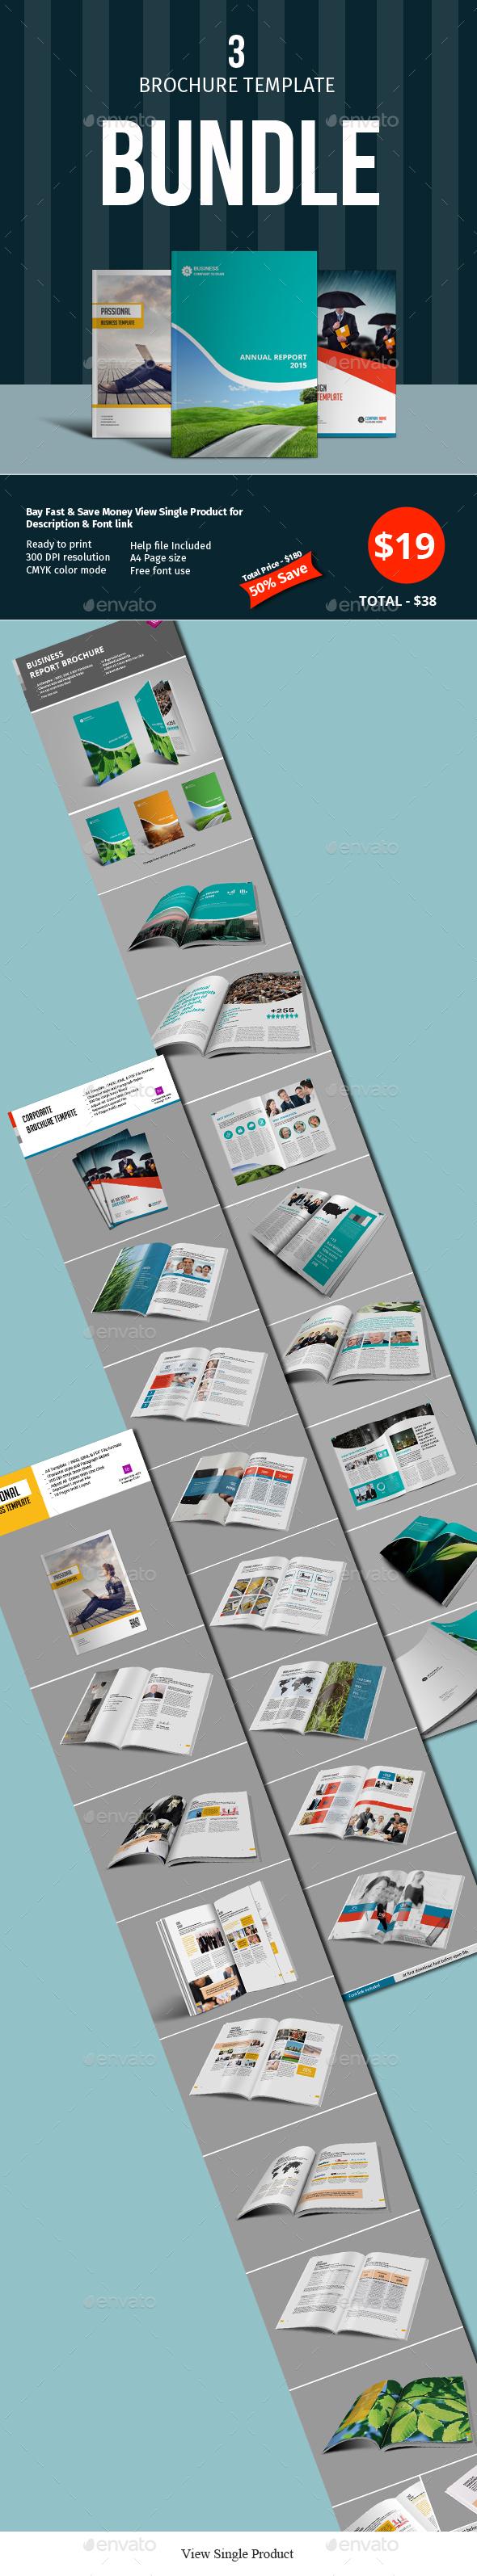 16 Pages 3 Brochure Template Bundle - Corporate Brochures